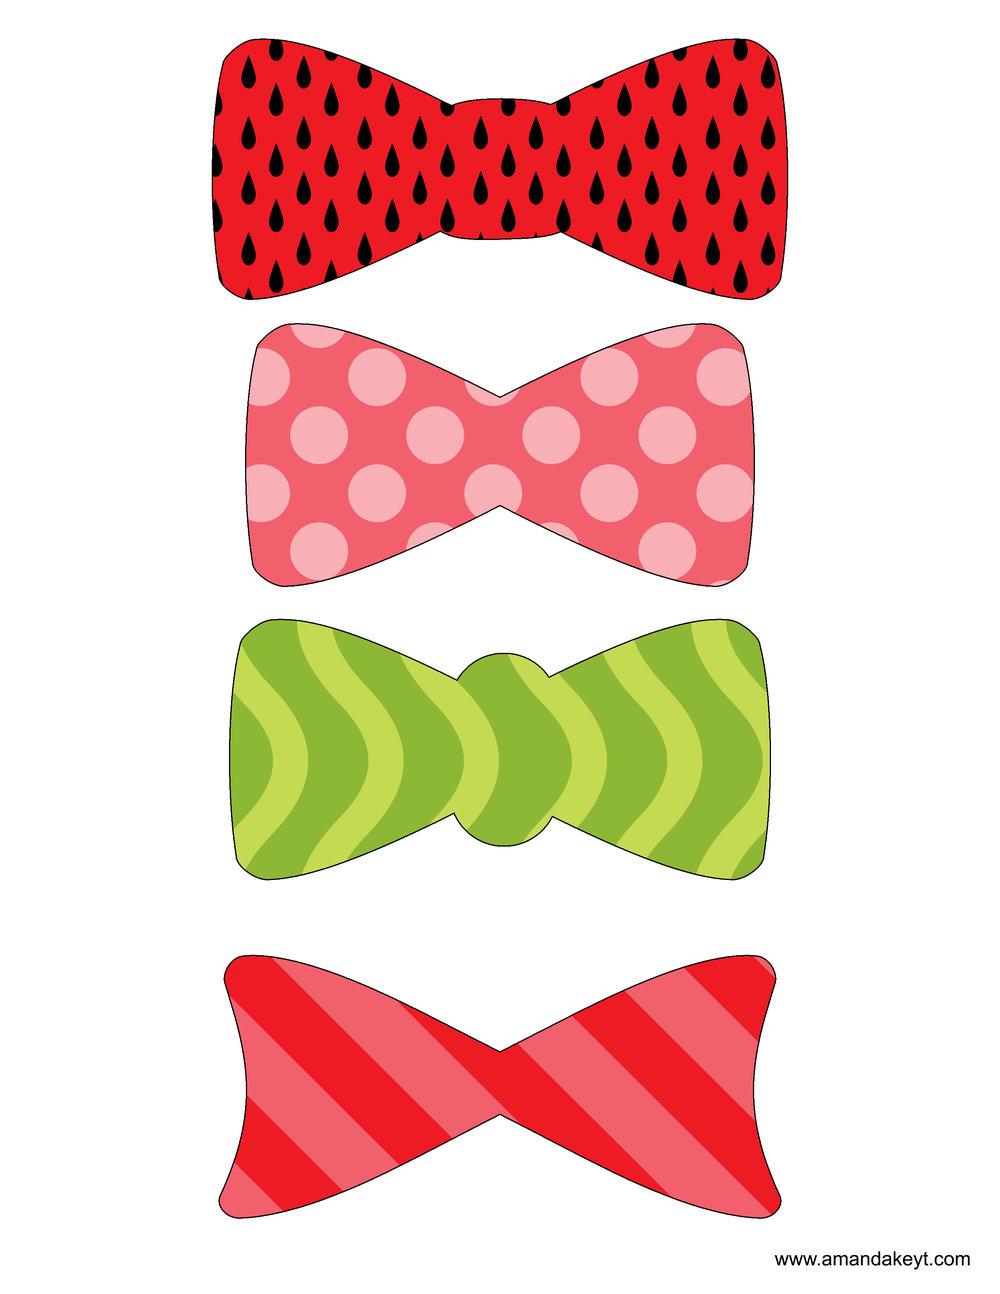 Bowties (2).jpg